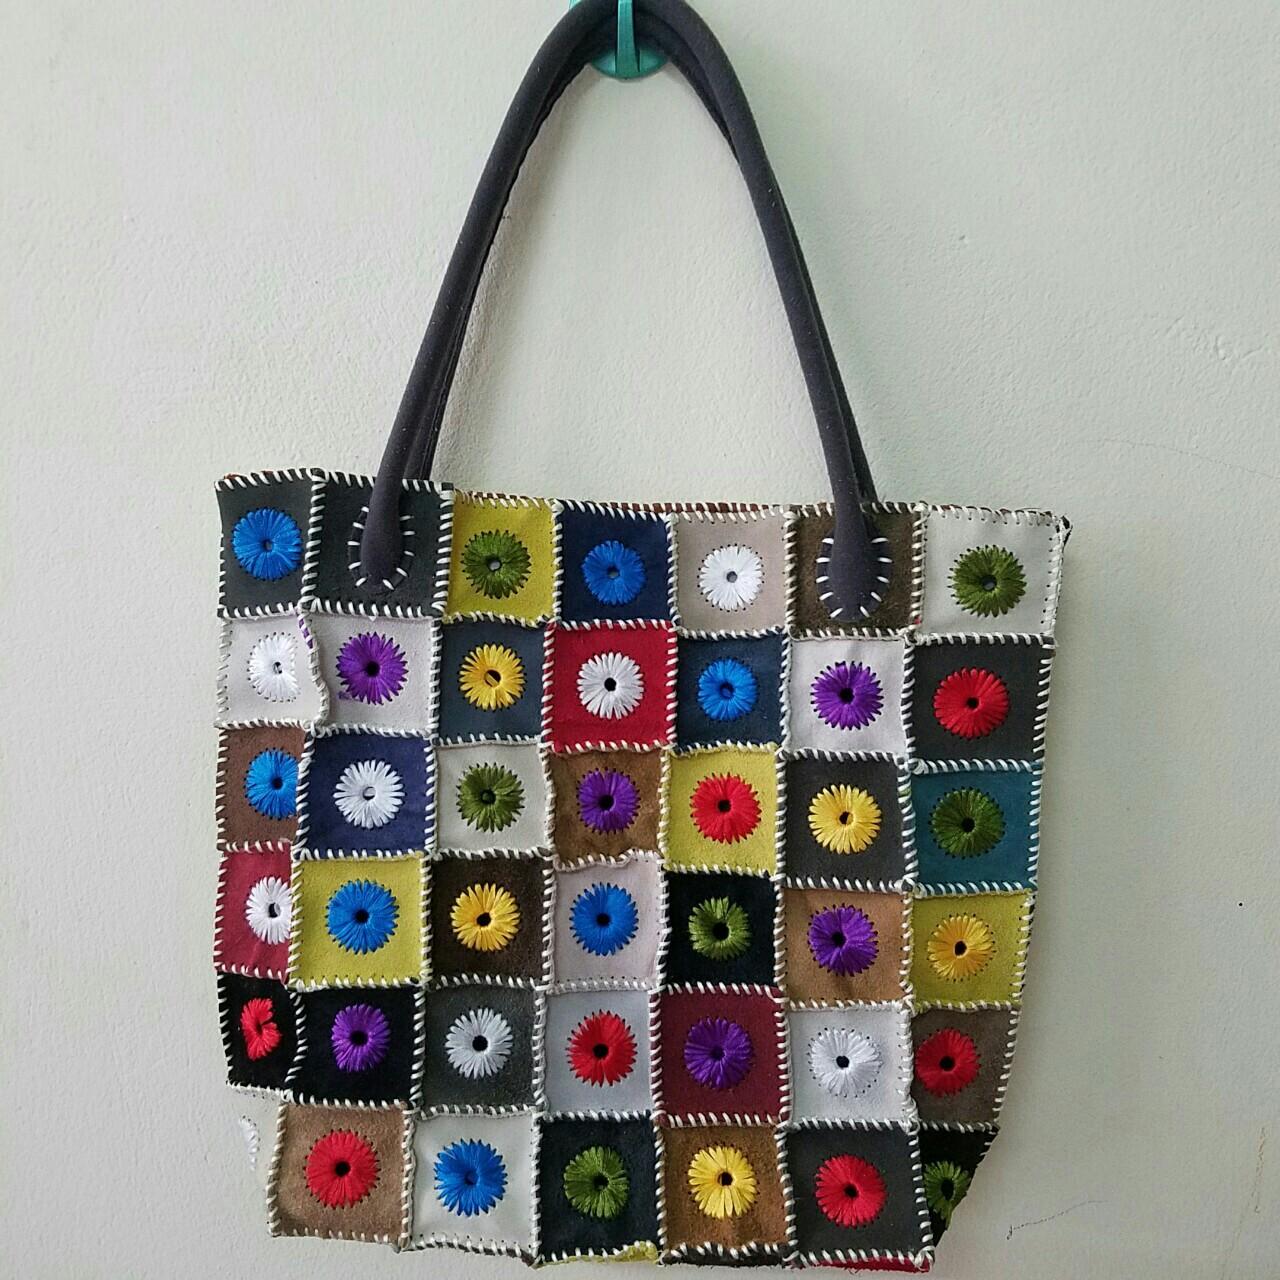 Túi xách da lộn thêu hoa